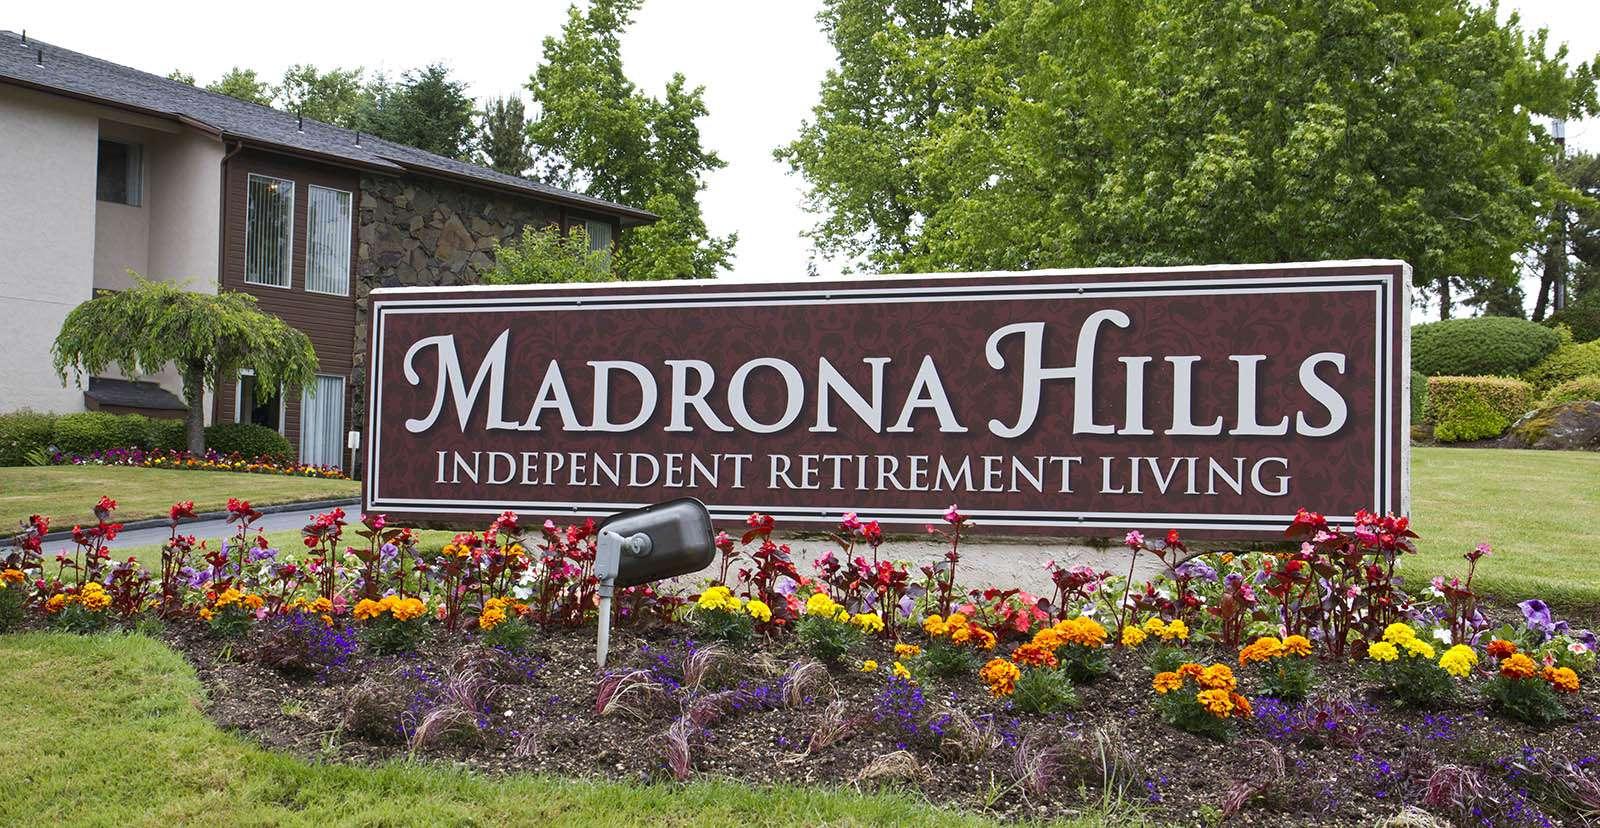 Madrona Hills image 10